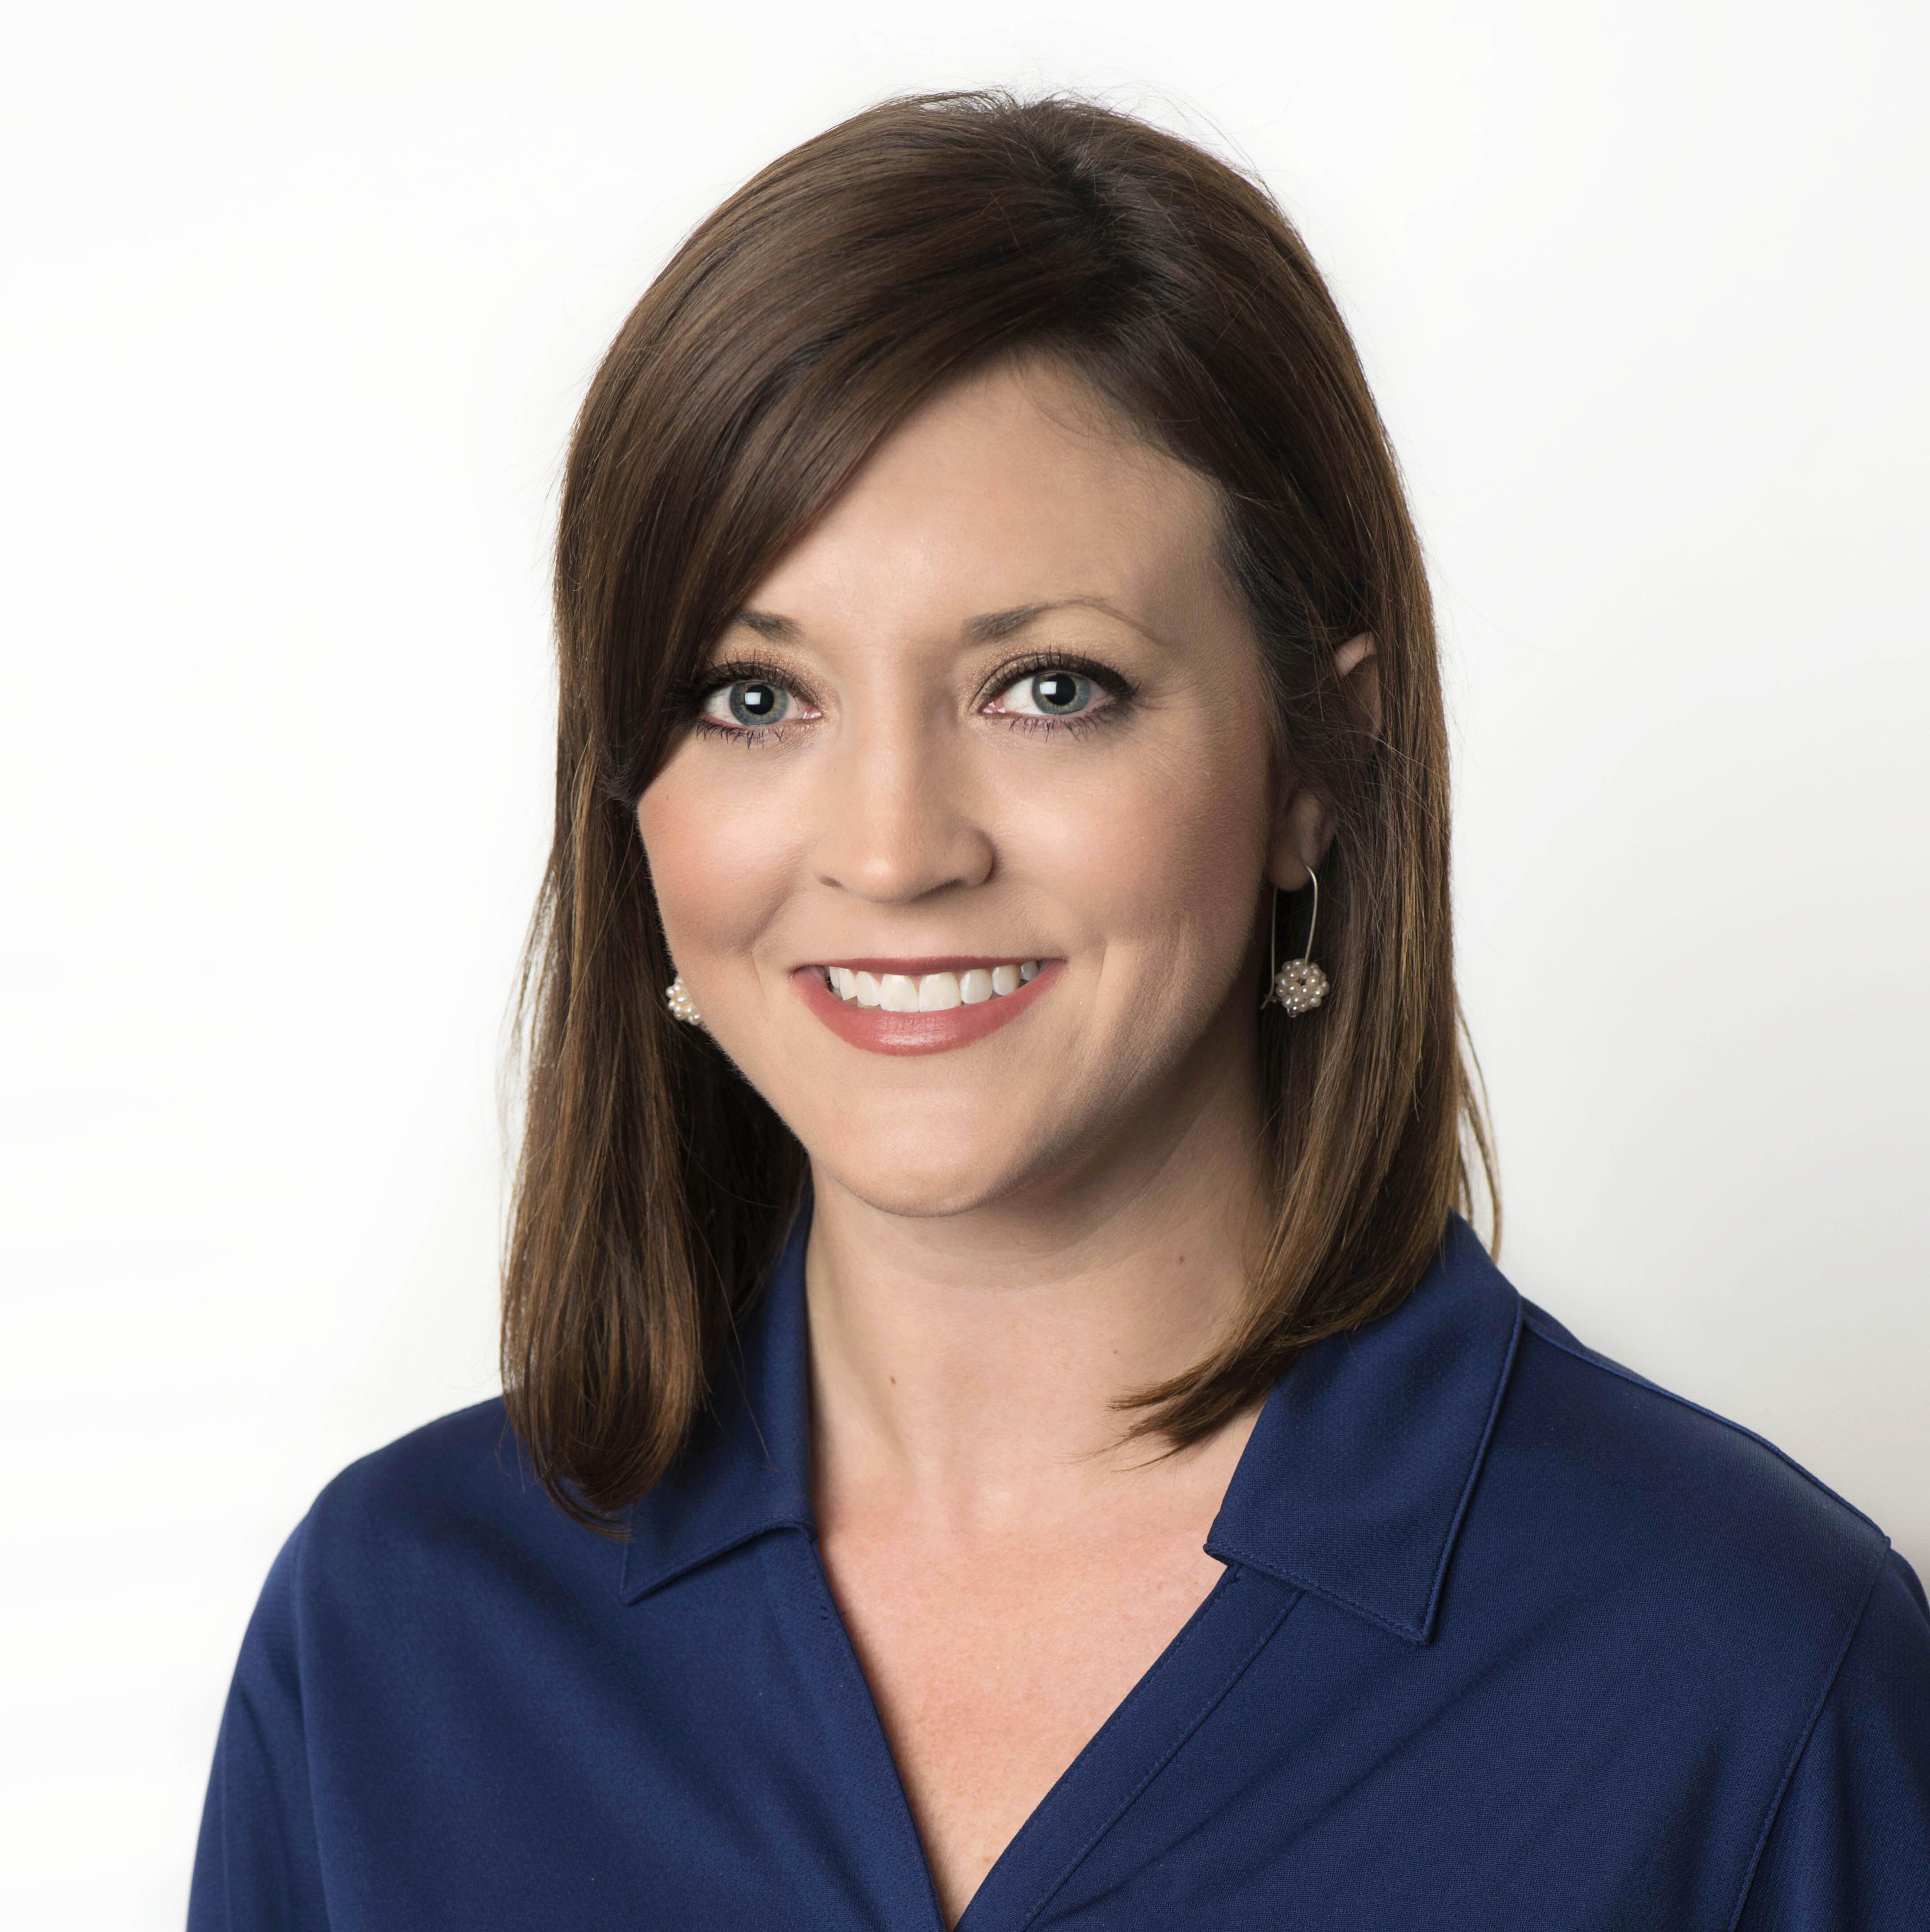 Laura Leigh Barrett